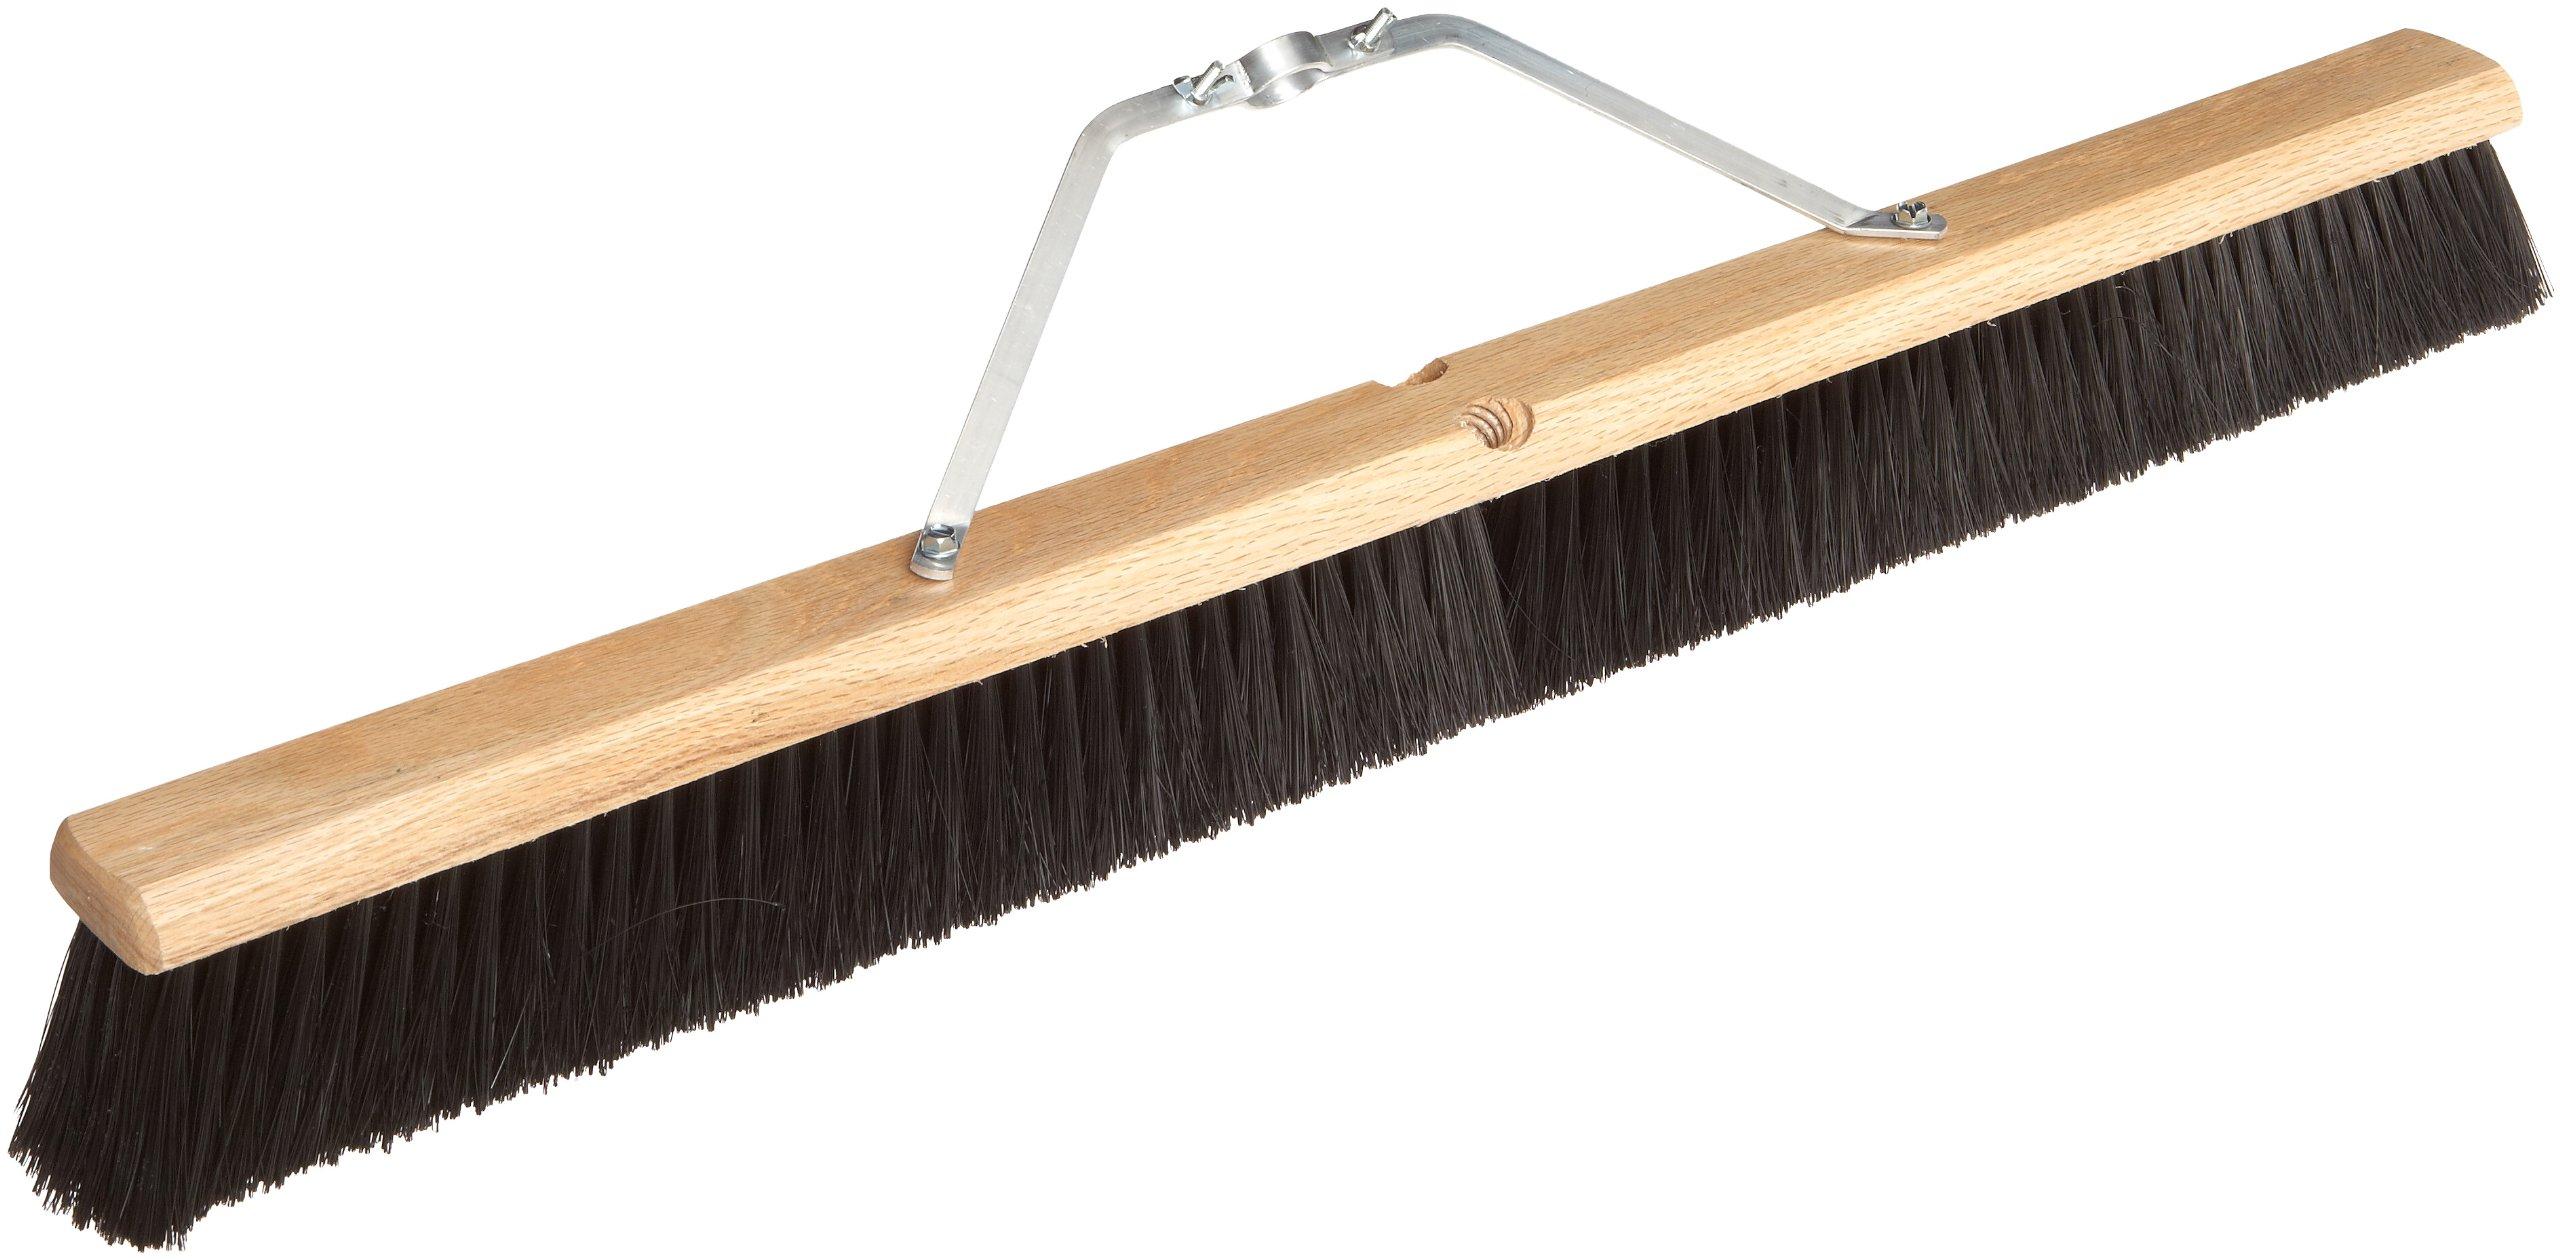 No. 20 Line Floor Brushes - 36'' floor brush w/m60 2d4b1d